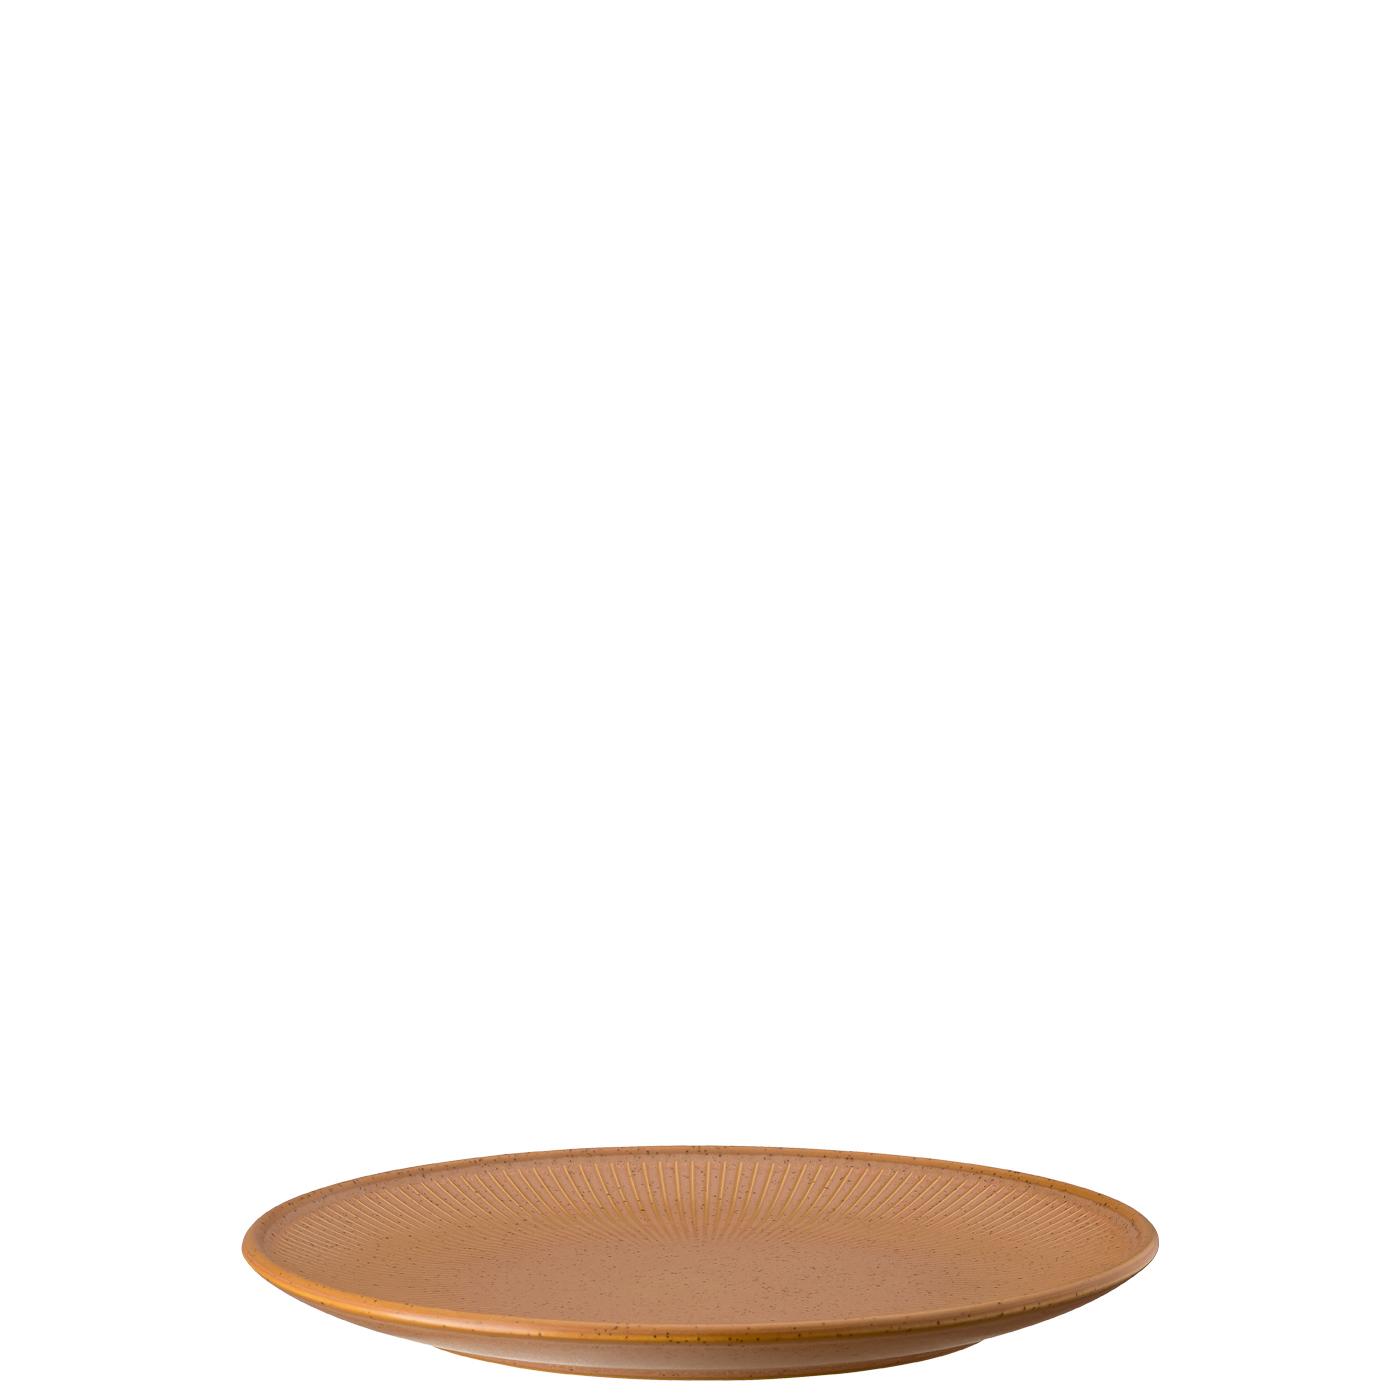 Frühstücksteller 22 cm Thomas Clay Earth Thomas Porzellan